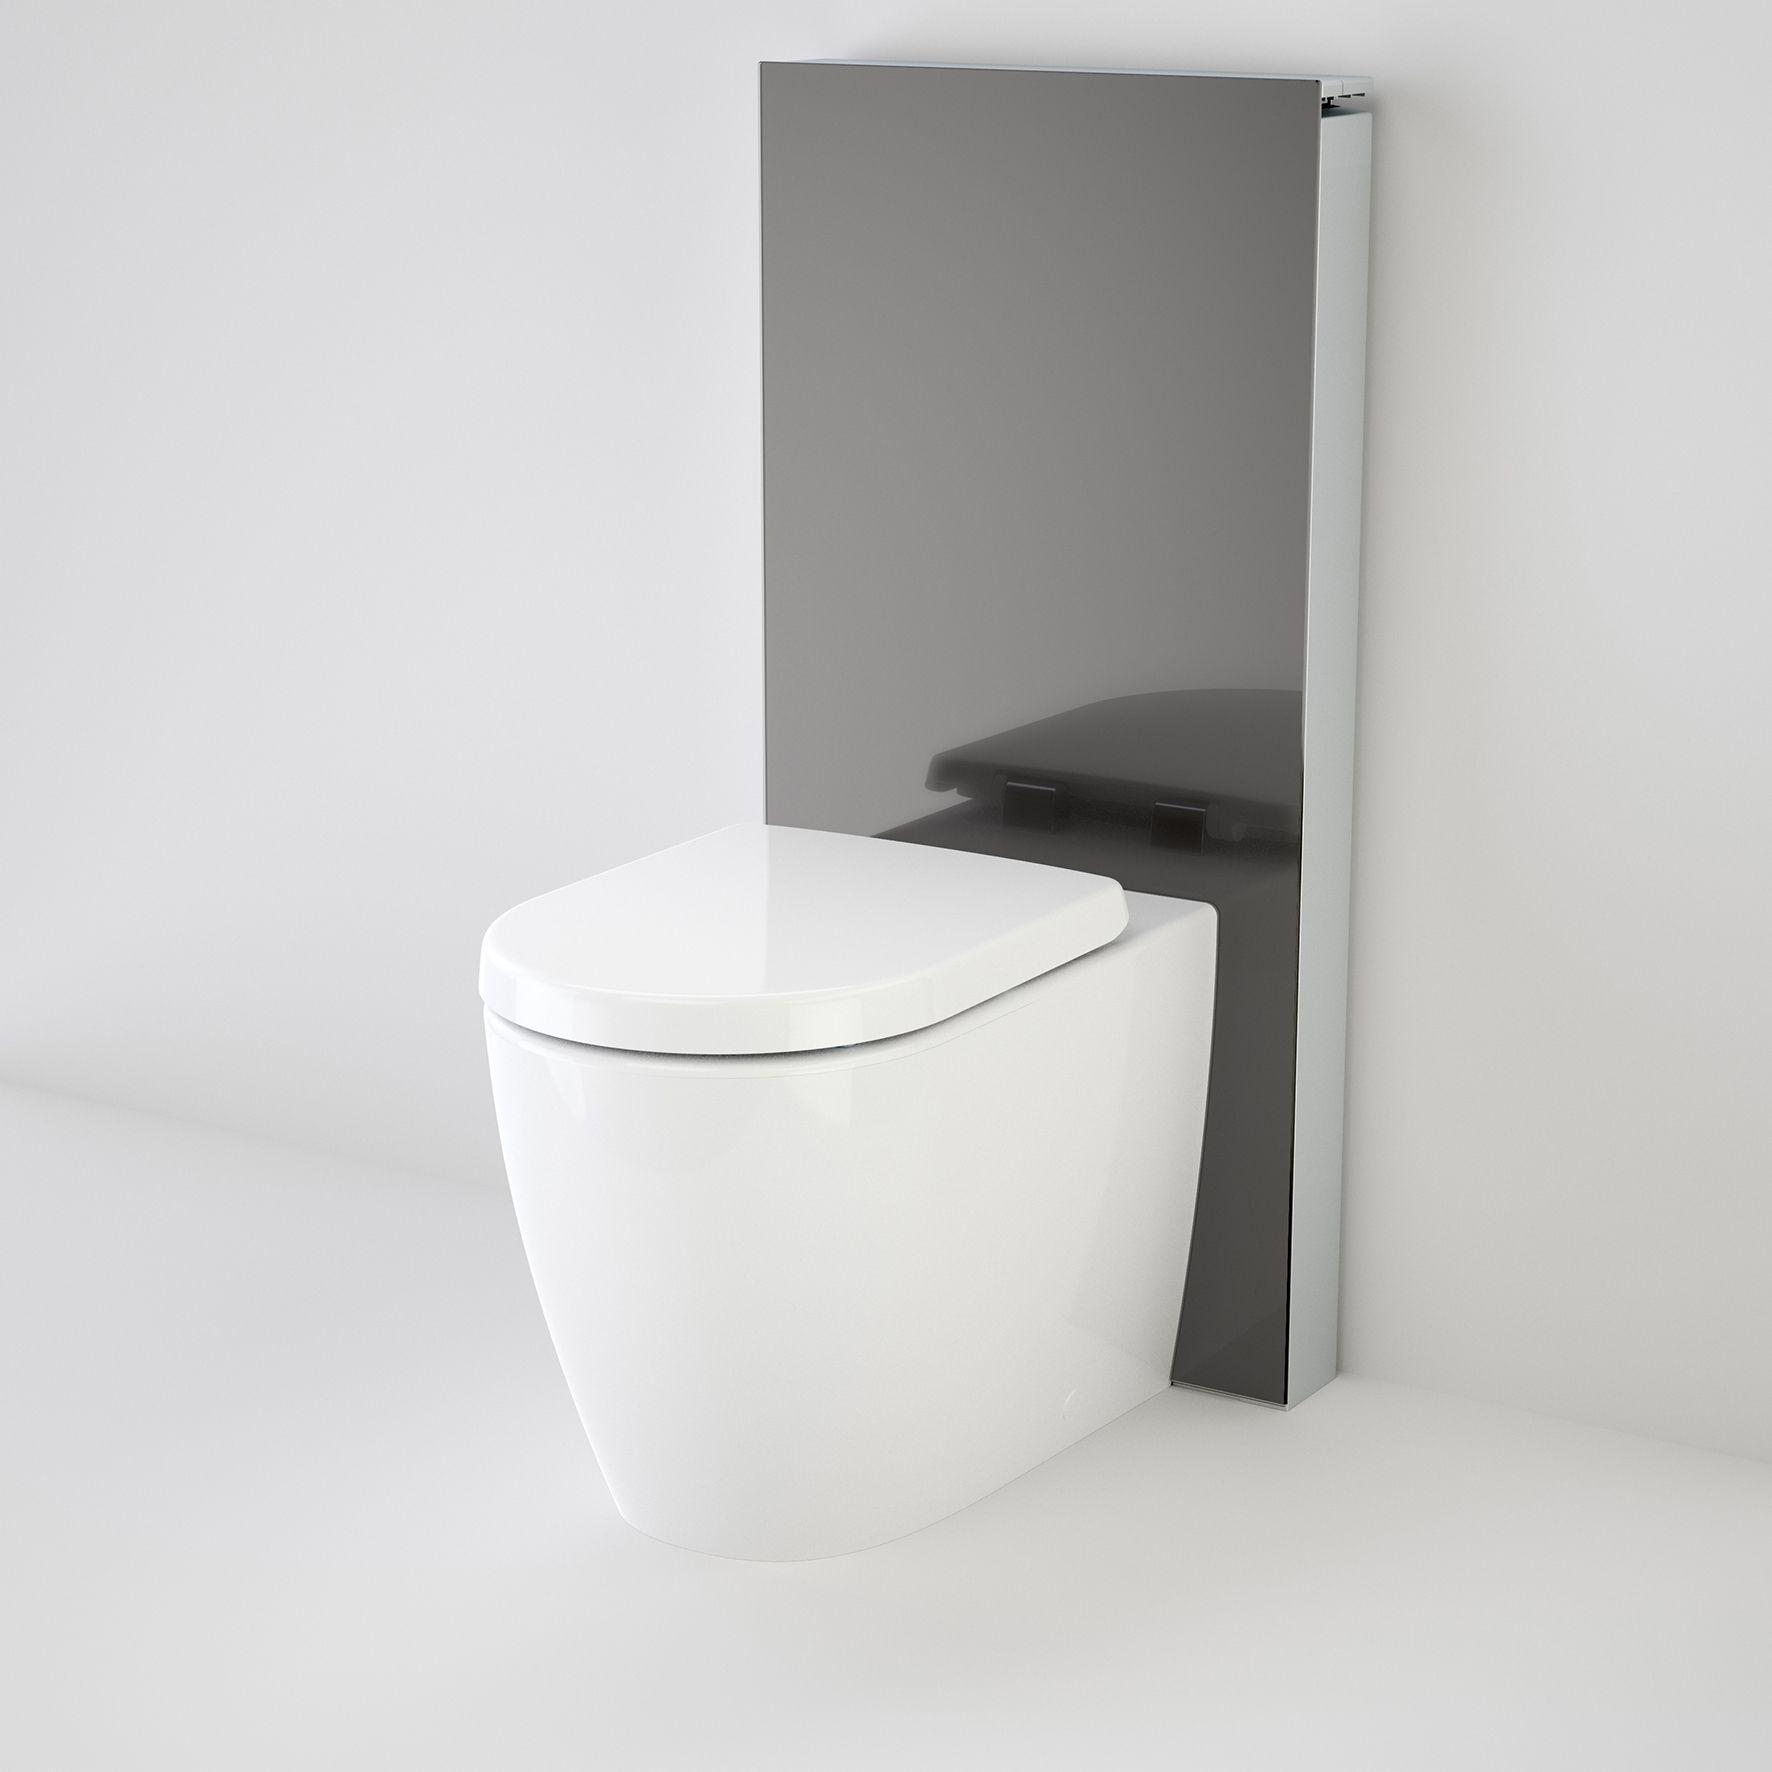 Caroma Puro Urbane Wall Faced Toilet Suite http://www.caroma.com.au ...